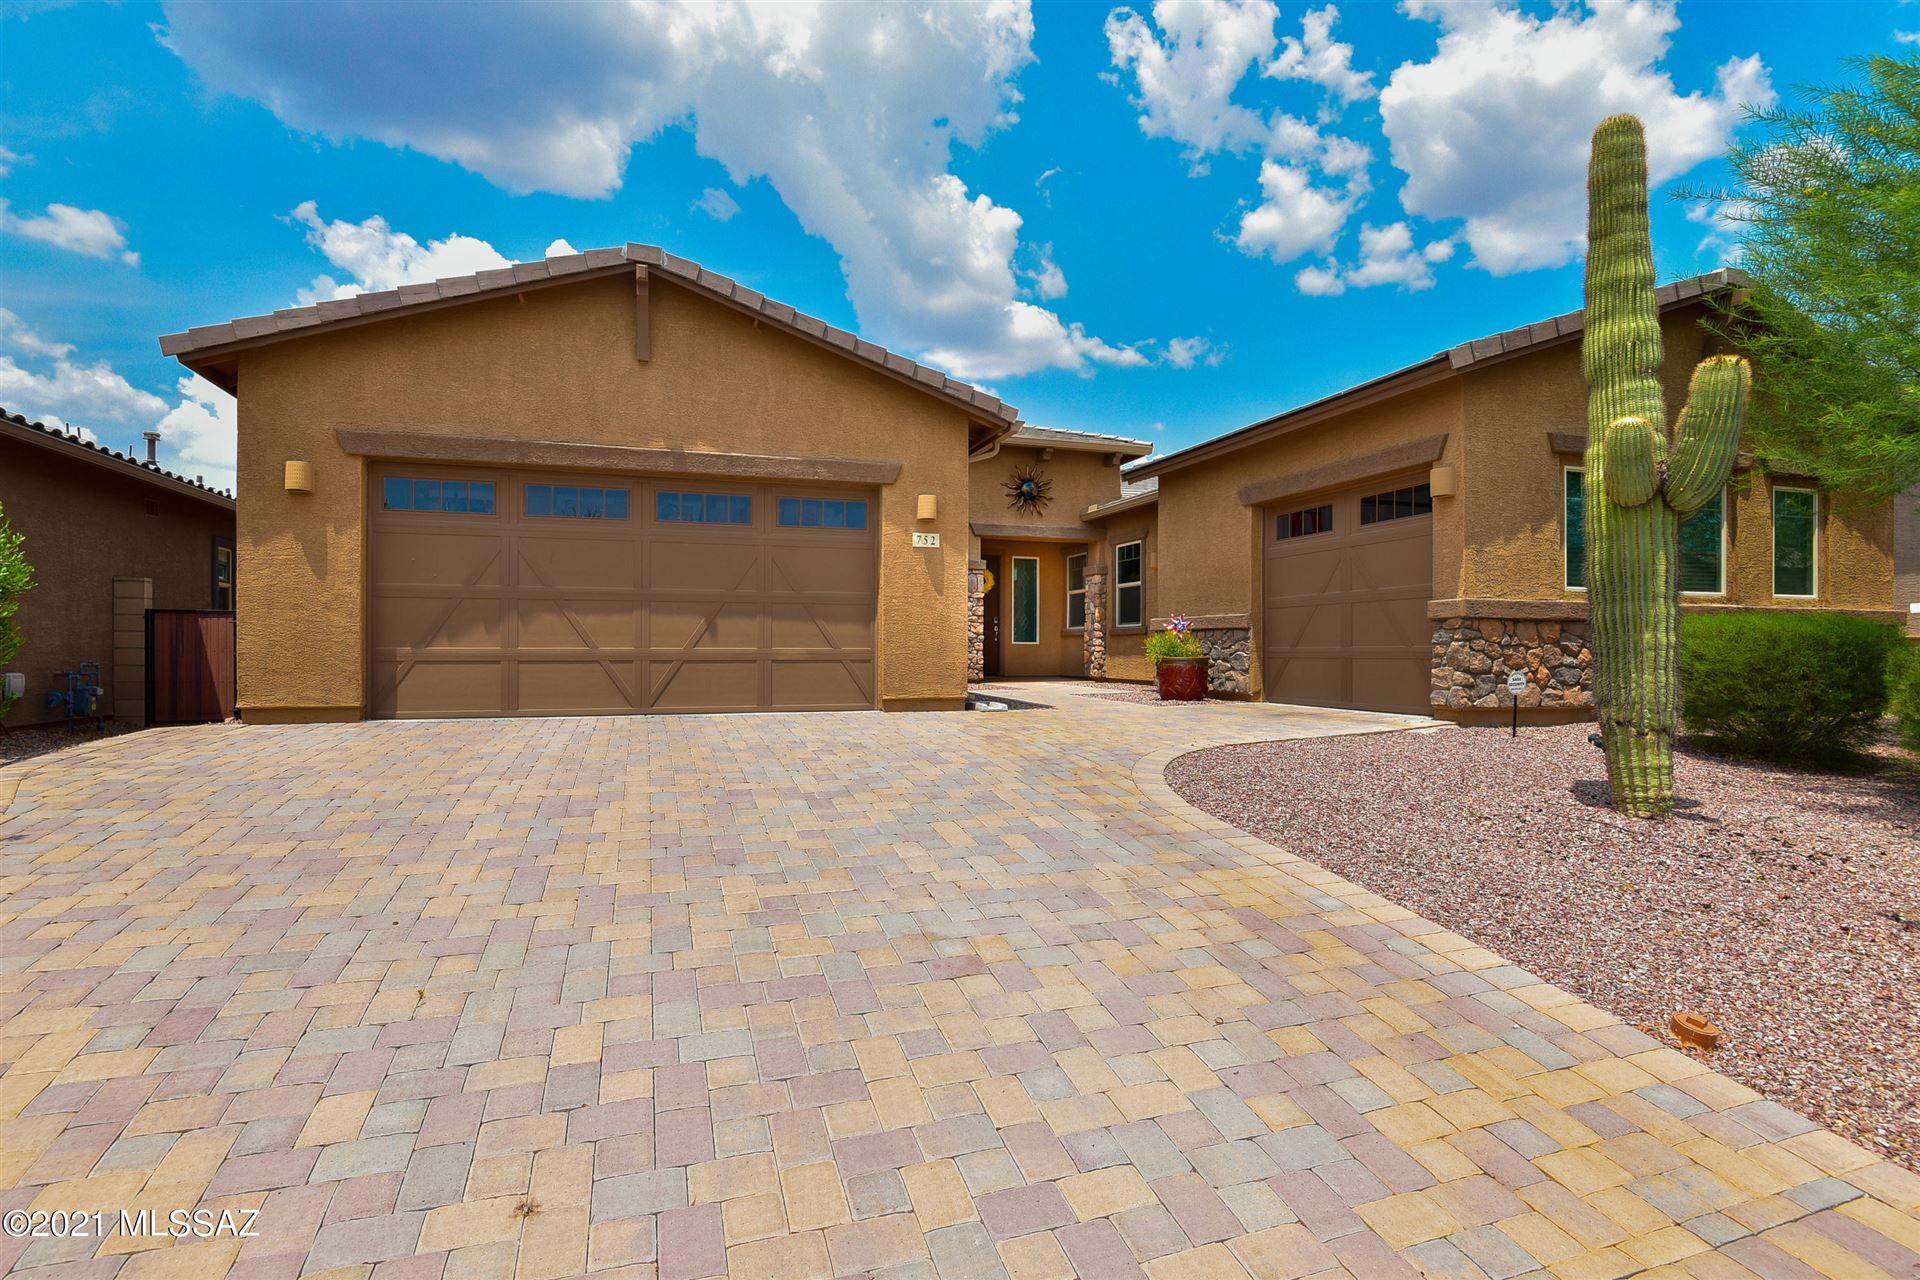 752 W Champions Run Way, Oro Valley, AZ 85755 - MLS#: 22117562